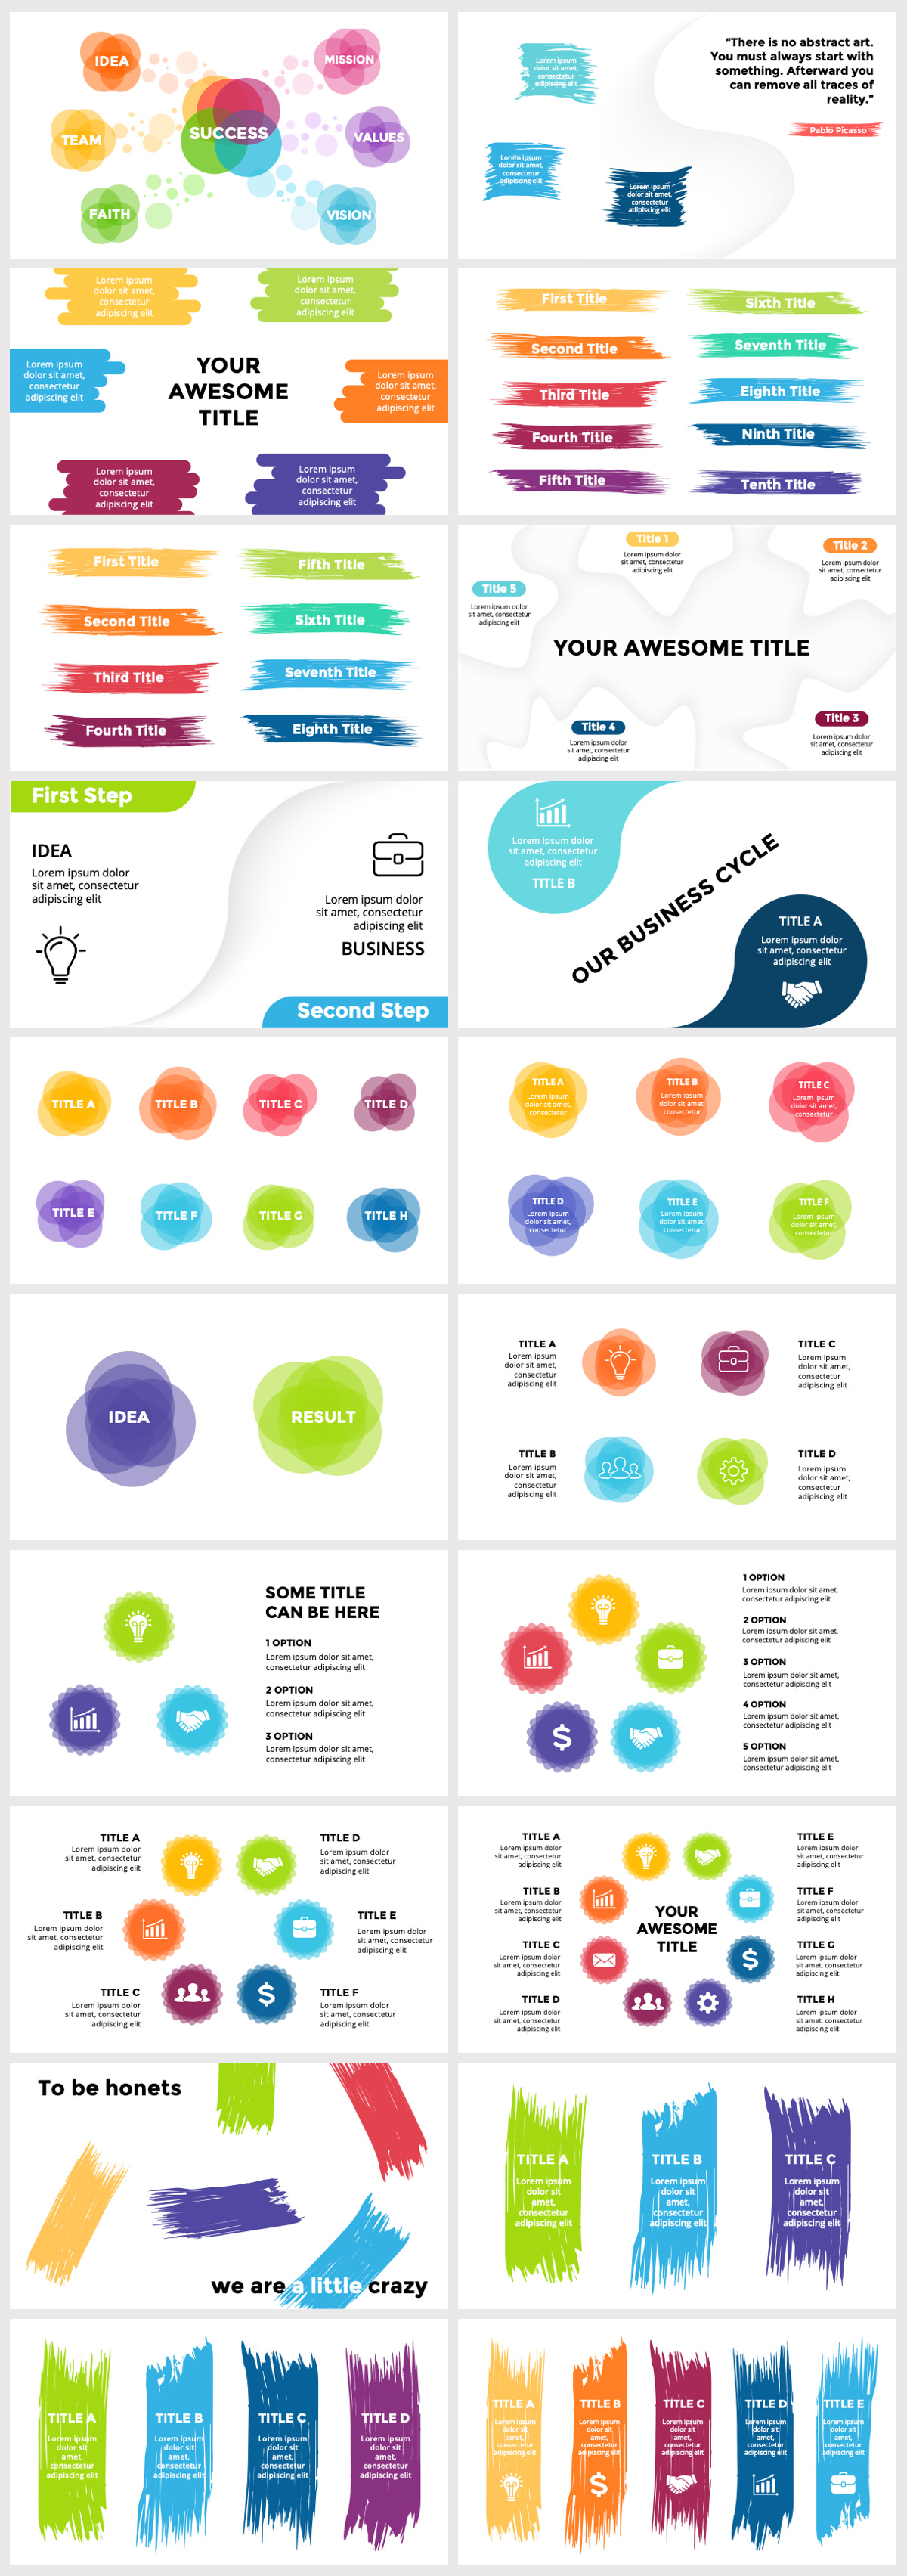 Huge Infographics Bundle! Lifetime Updates! PowerPoint, Photoshop, Illustrator. - 216